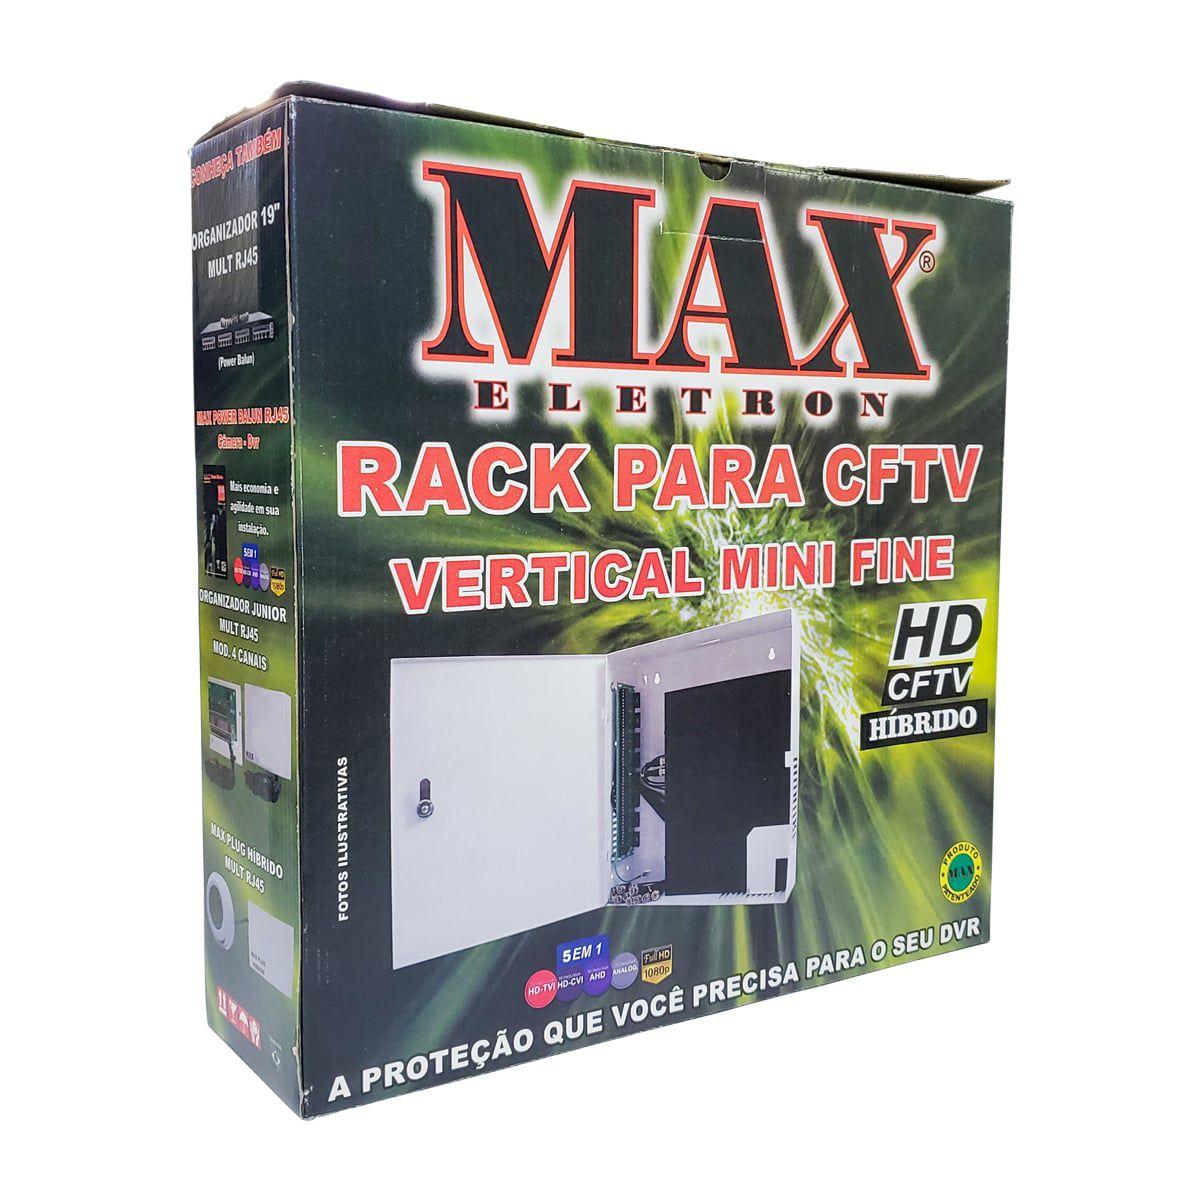 PÁSCOA CFTV CLUBE - Rack Vertical Fine c/ Placa Eletrônica 16 Canais Max Eletron  - CFTV Clube | Brasil